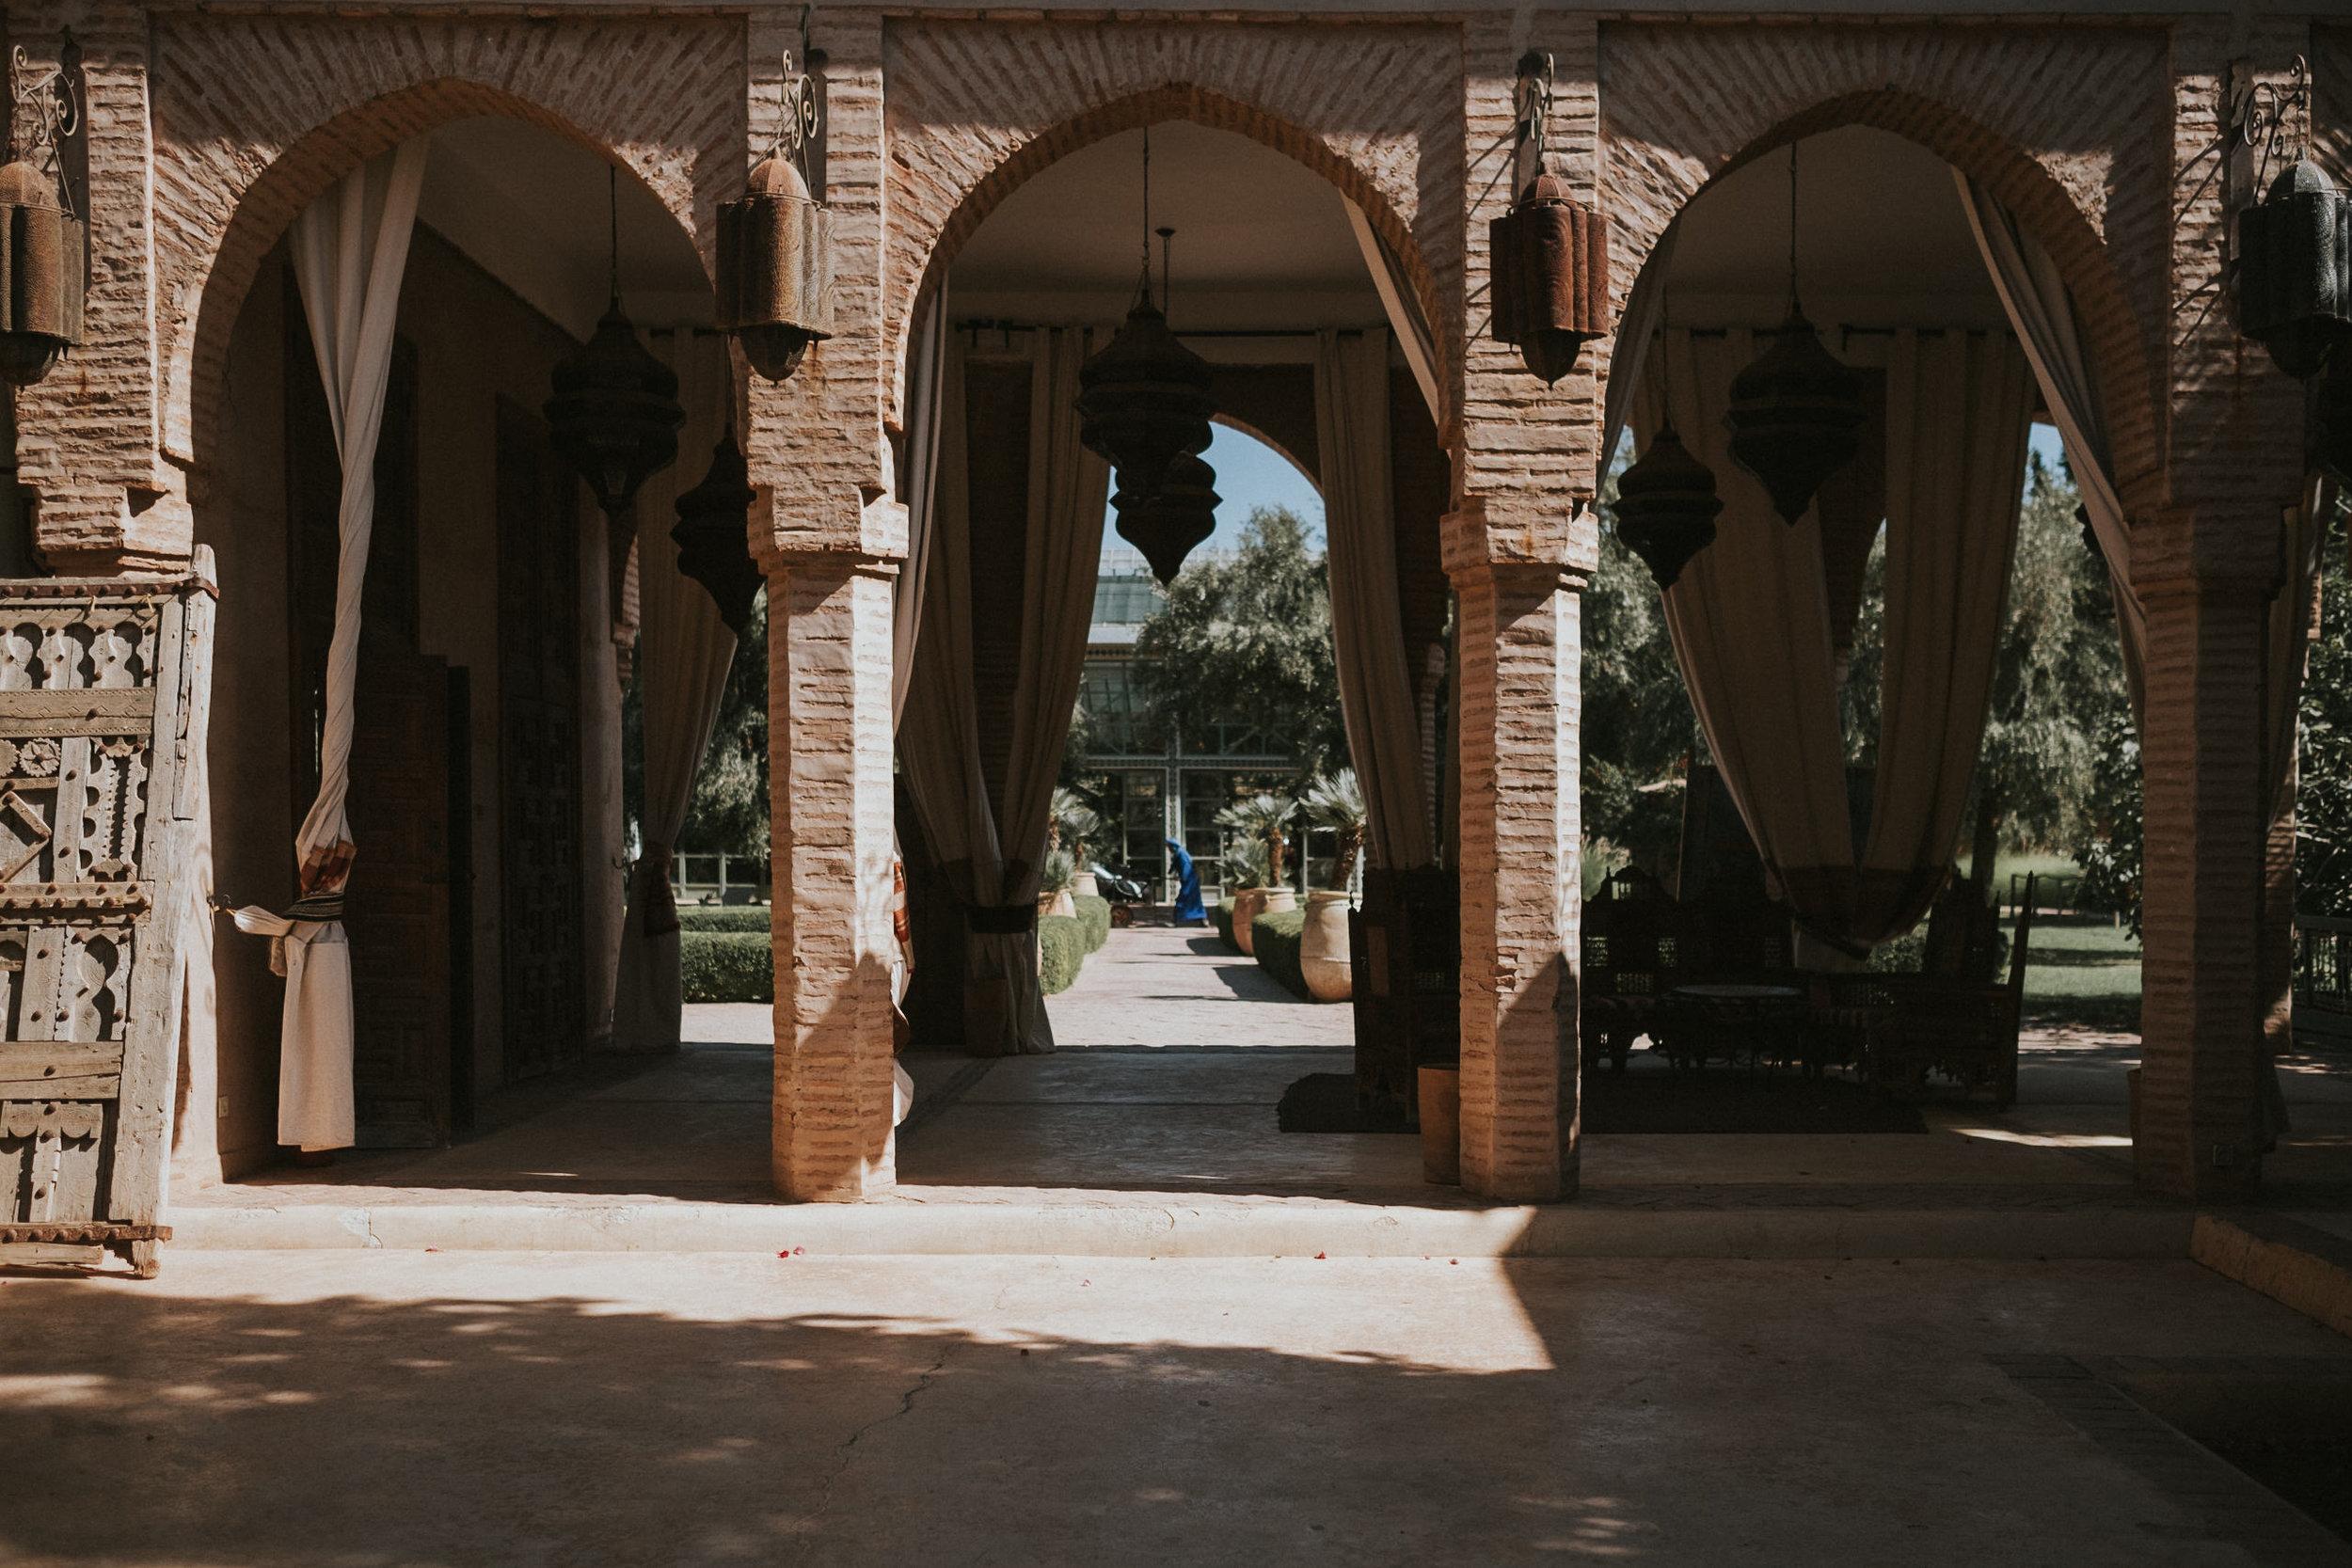 craig_nicholas_photography_beldi_morocco (1 of 1)-4.jpg